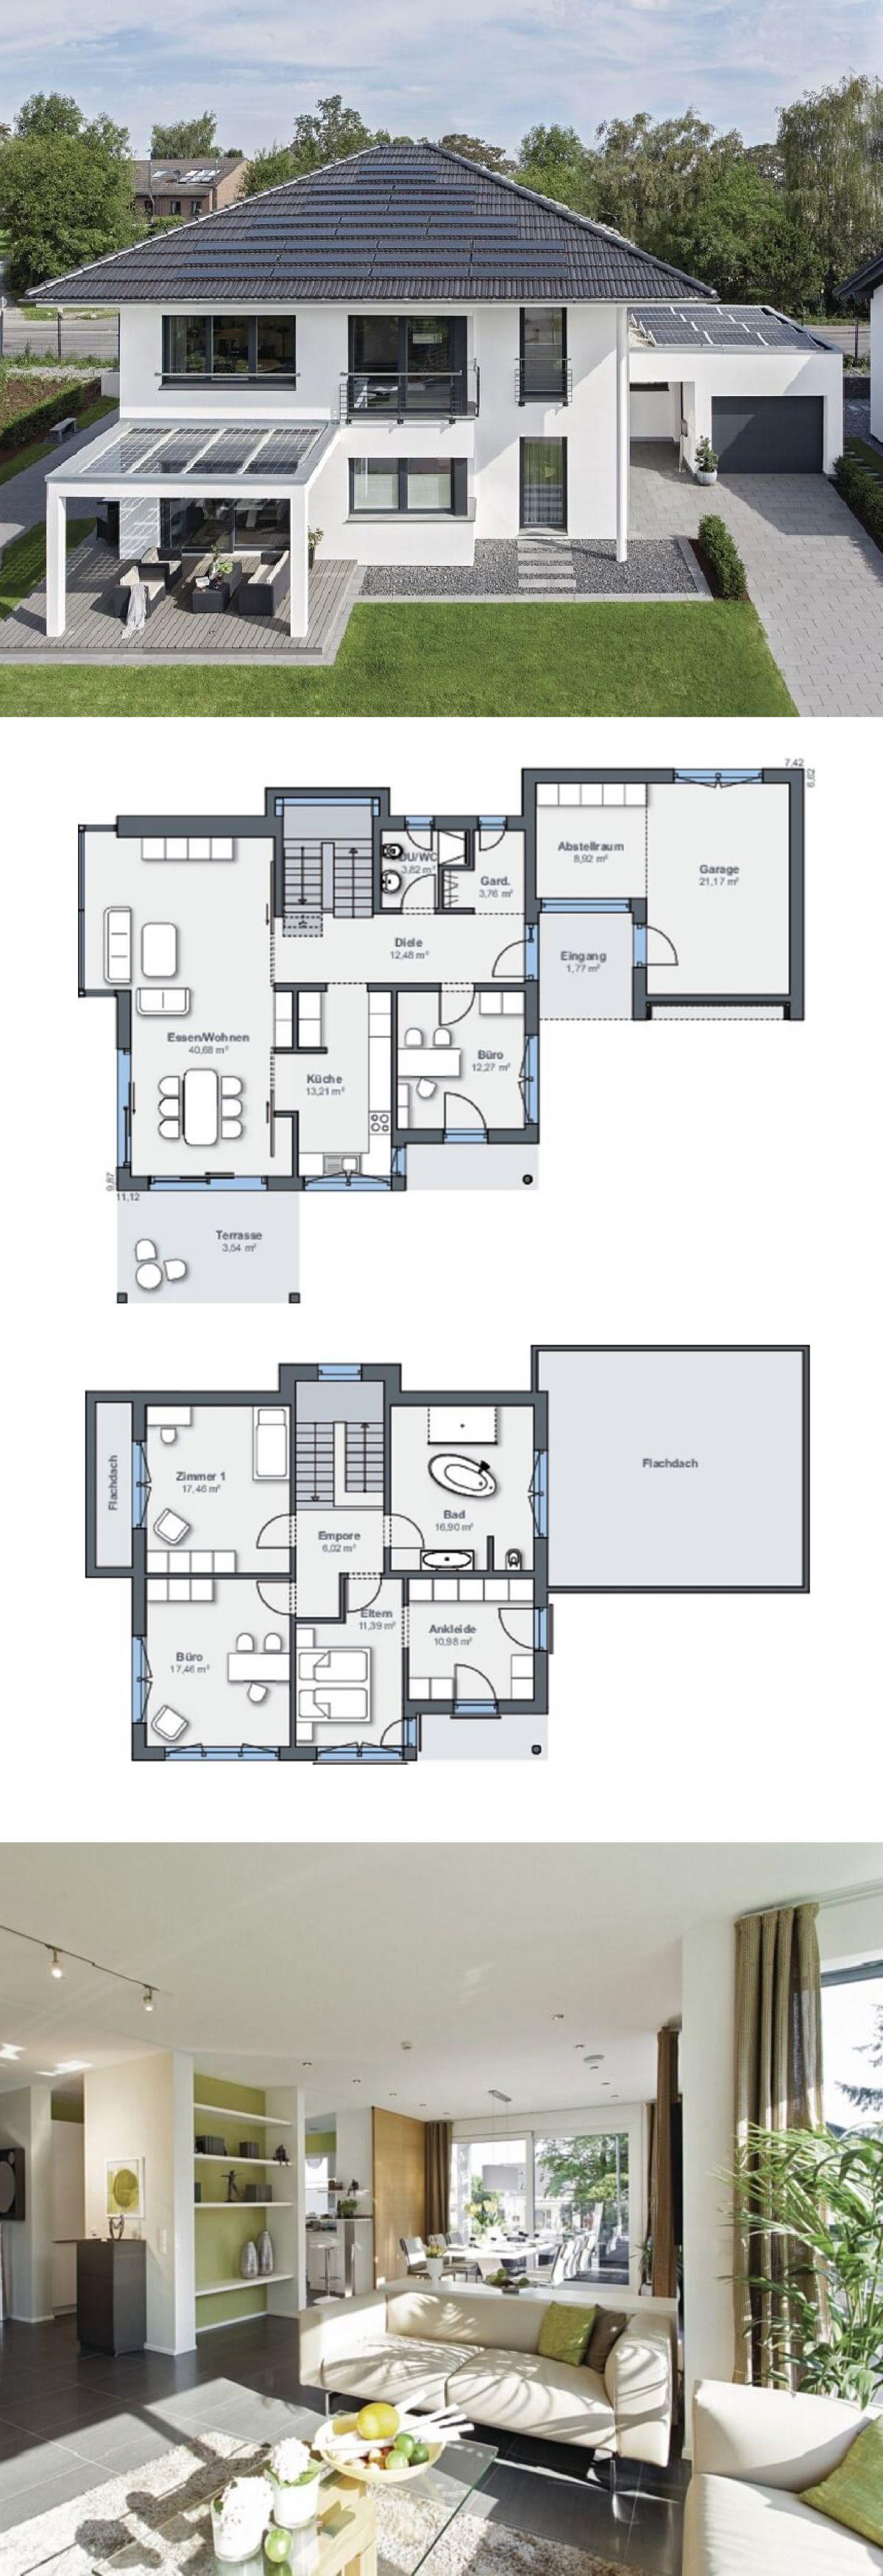 modernes design haus mit garage pergola grundriss einfamilienhaus city life haus 250. Black Bedroom Furniture Sets. Home Design Ideas